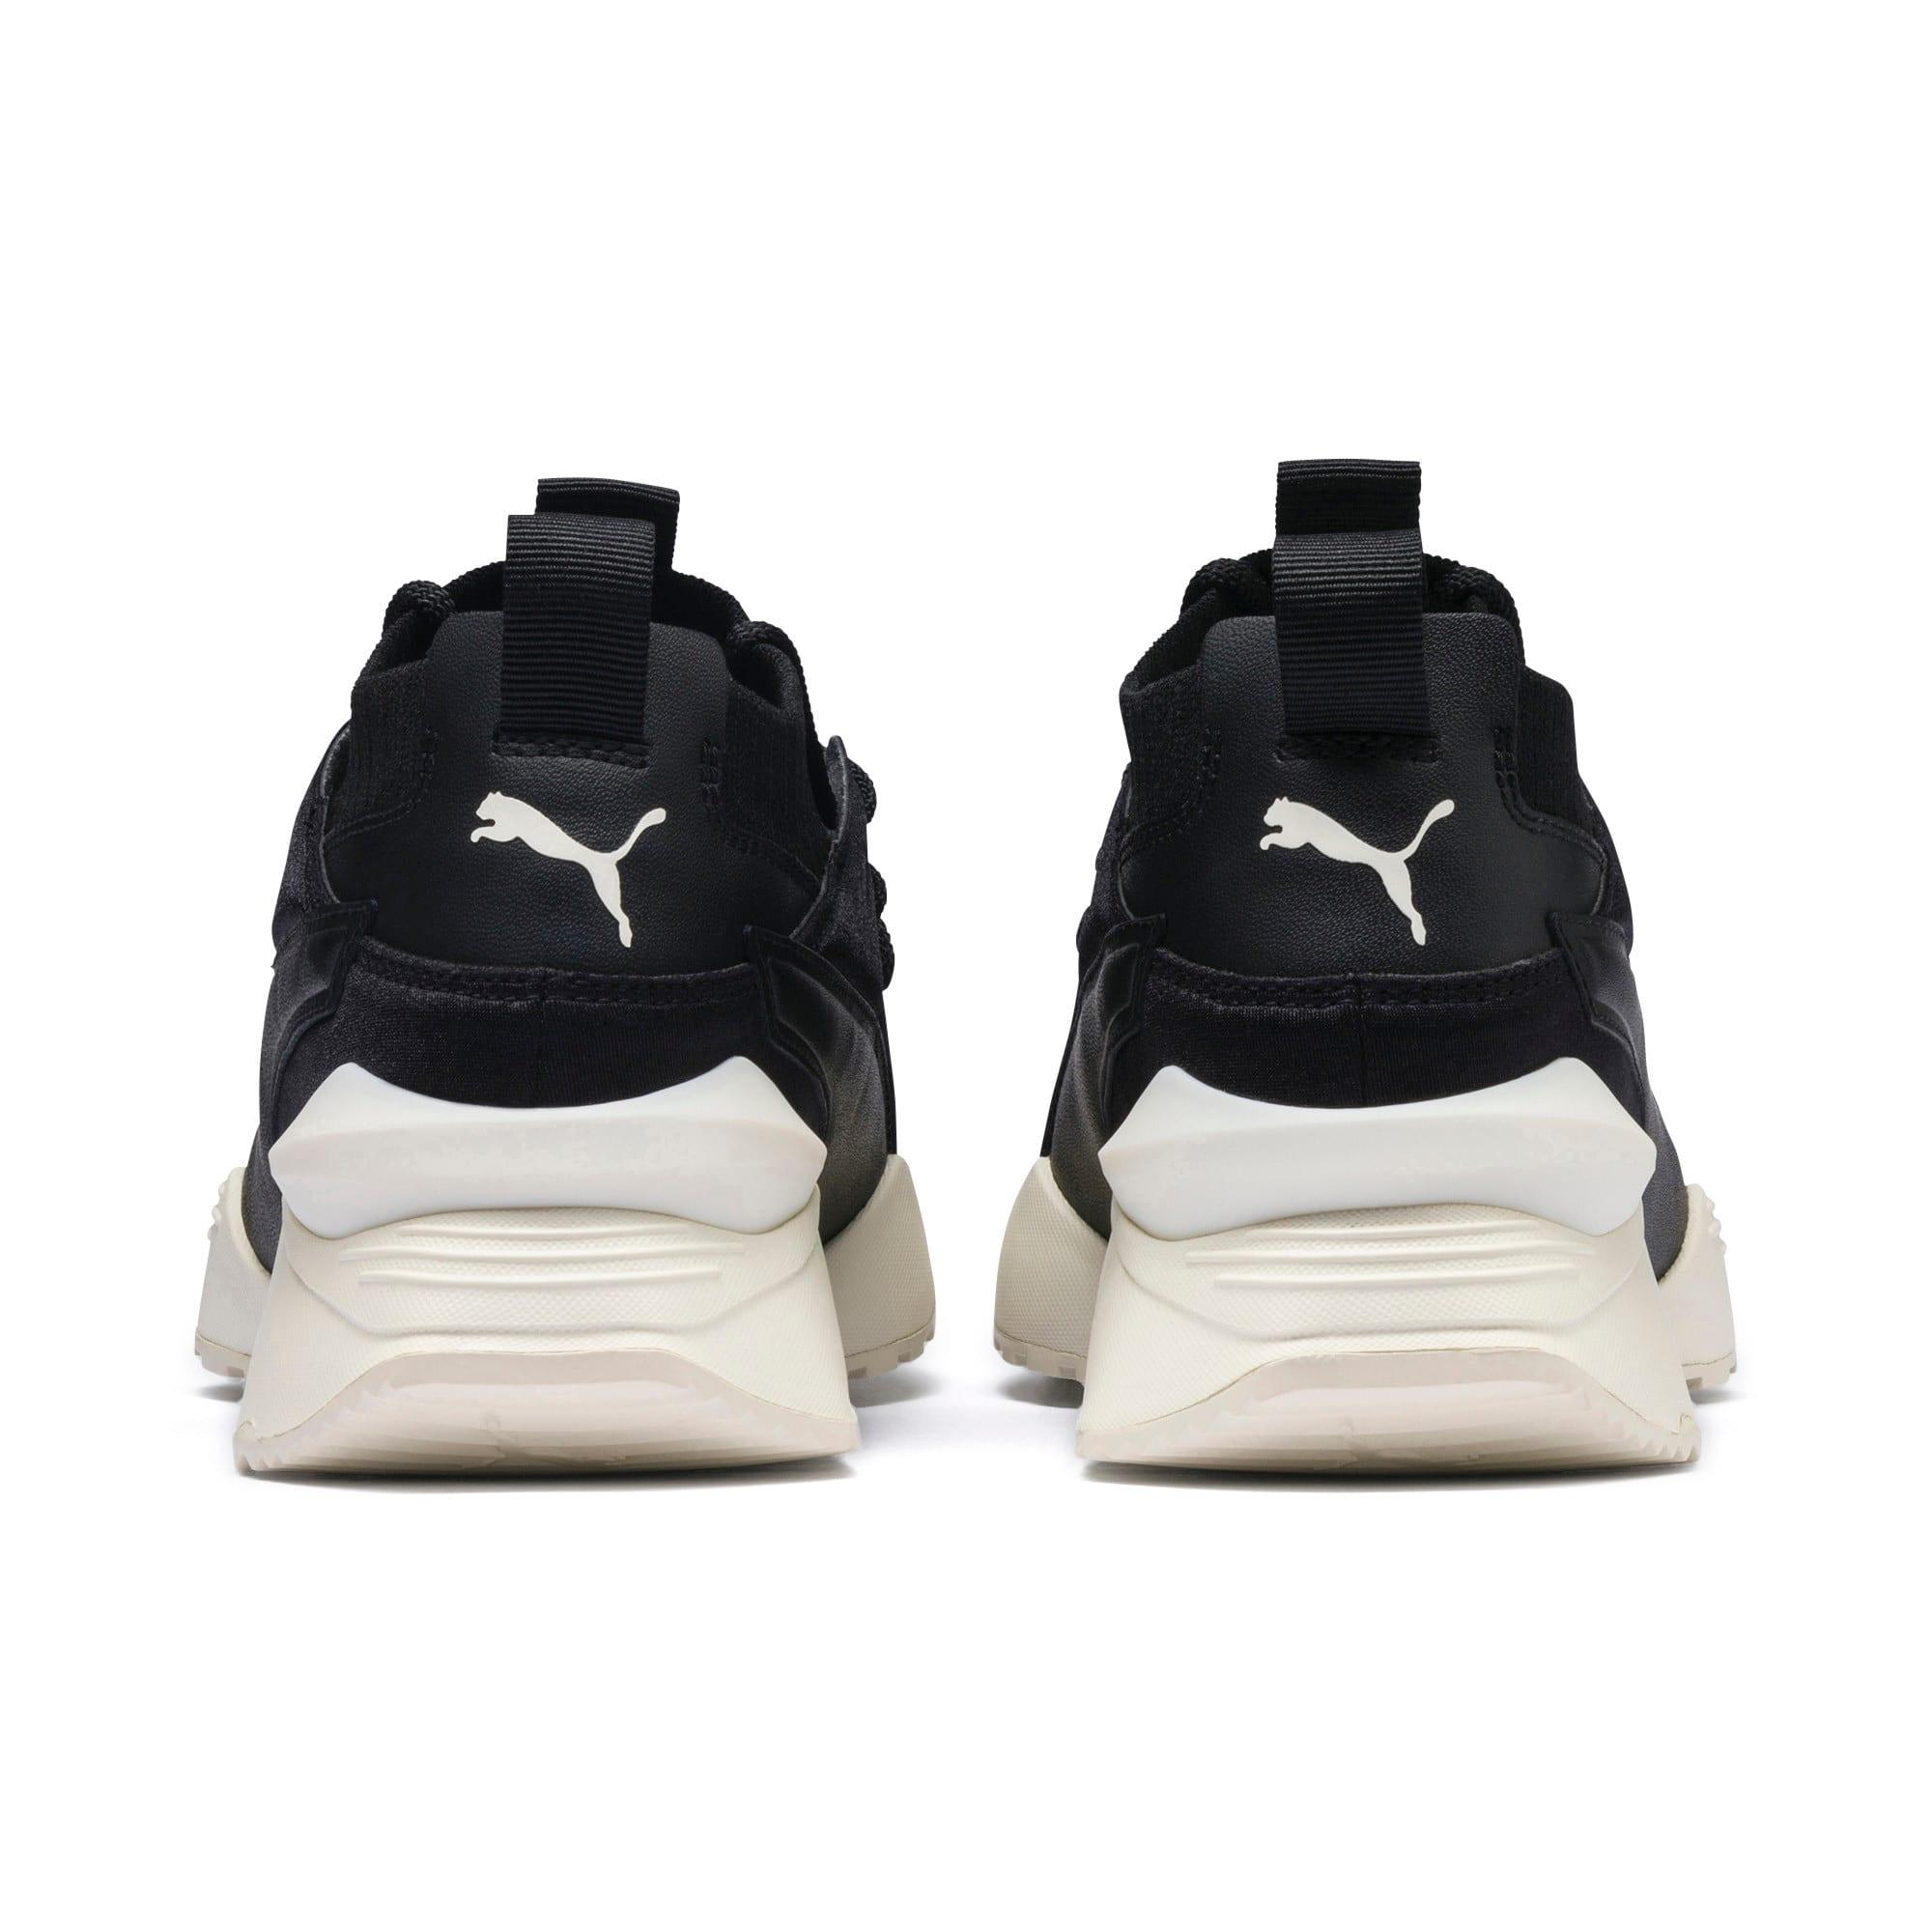 Thumbnail 4 of Muse Maia Knit Premium Damen Sneaker, Puma Black-Whisper White, medium